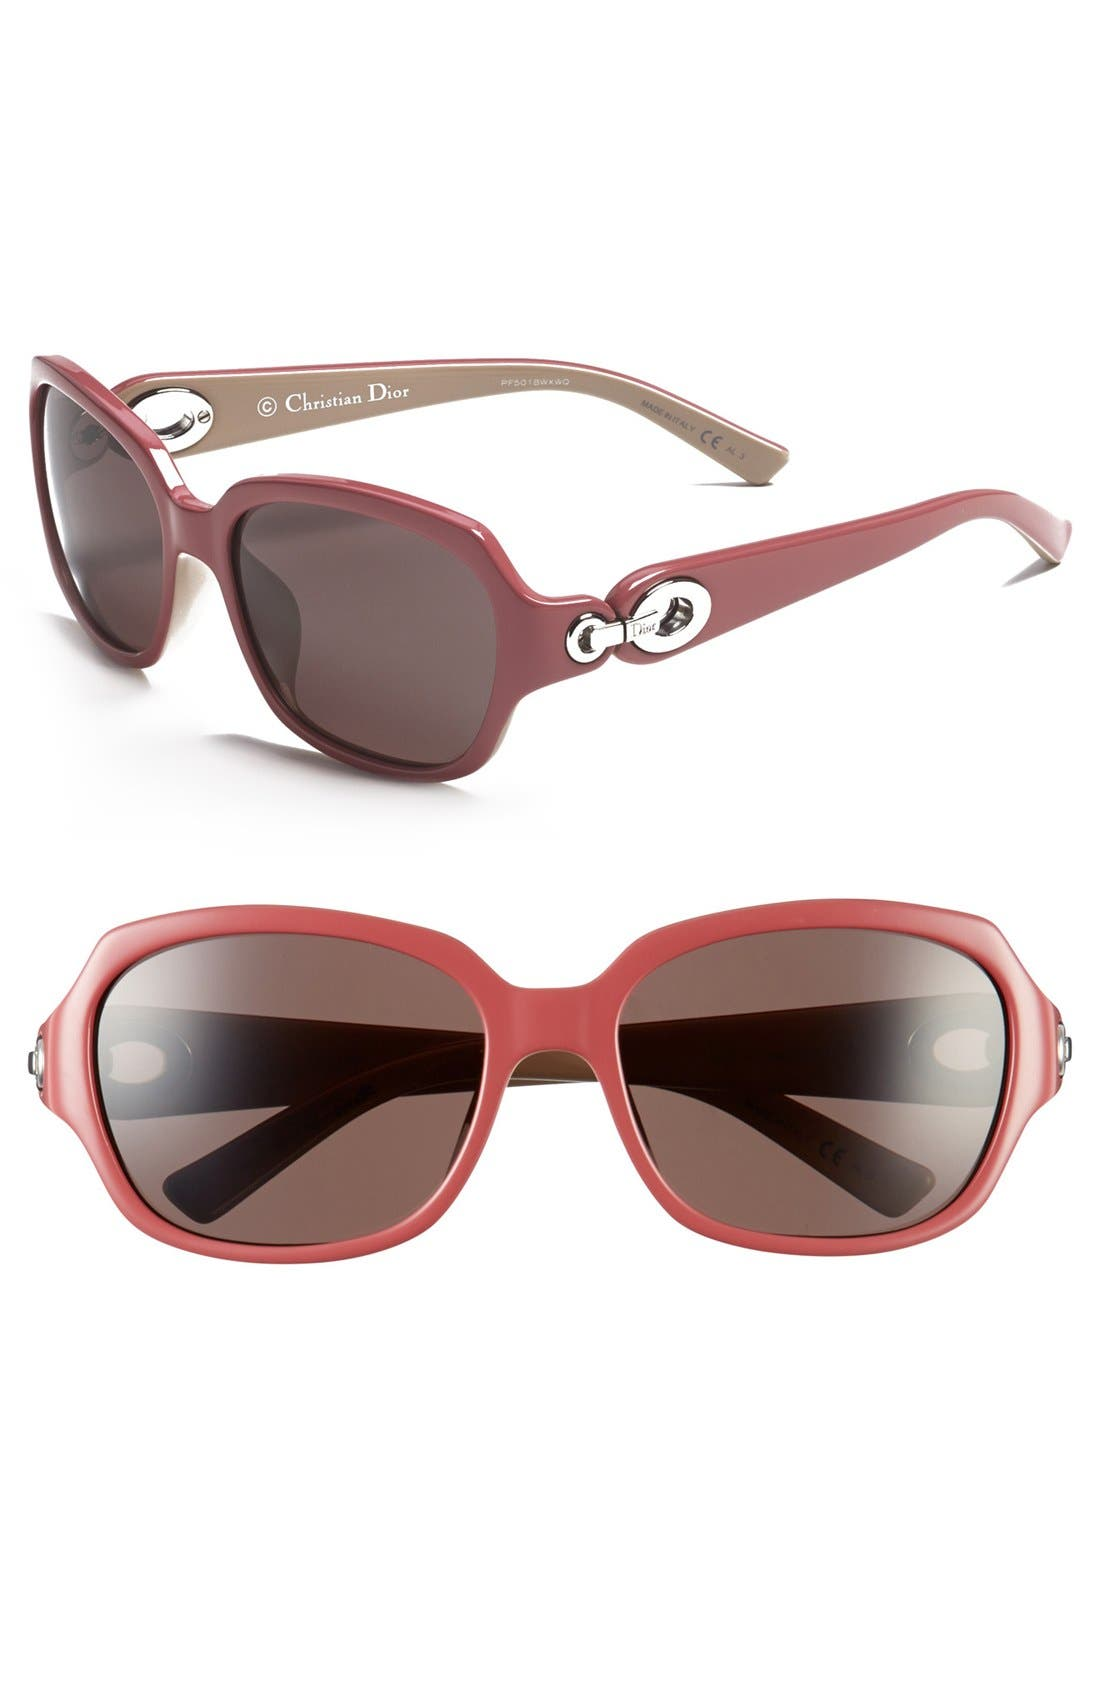 Main Image - Christian Dior 'Diorissimo 2' 56mm Sunglasses